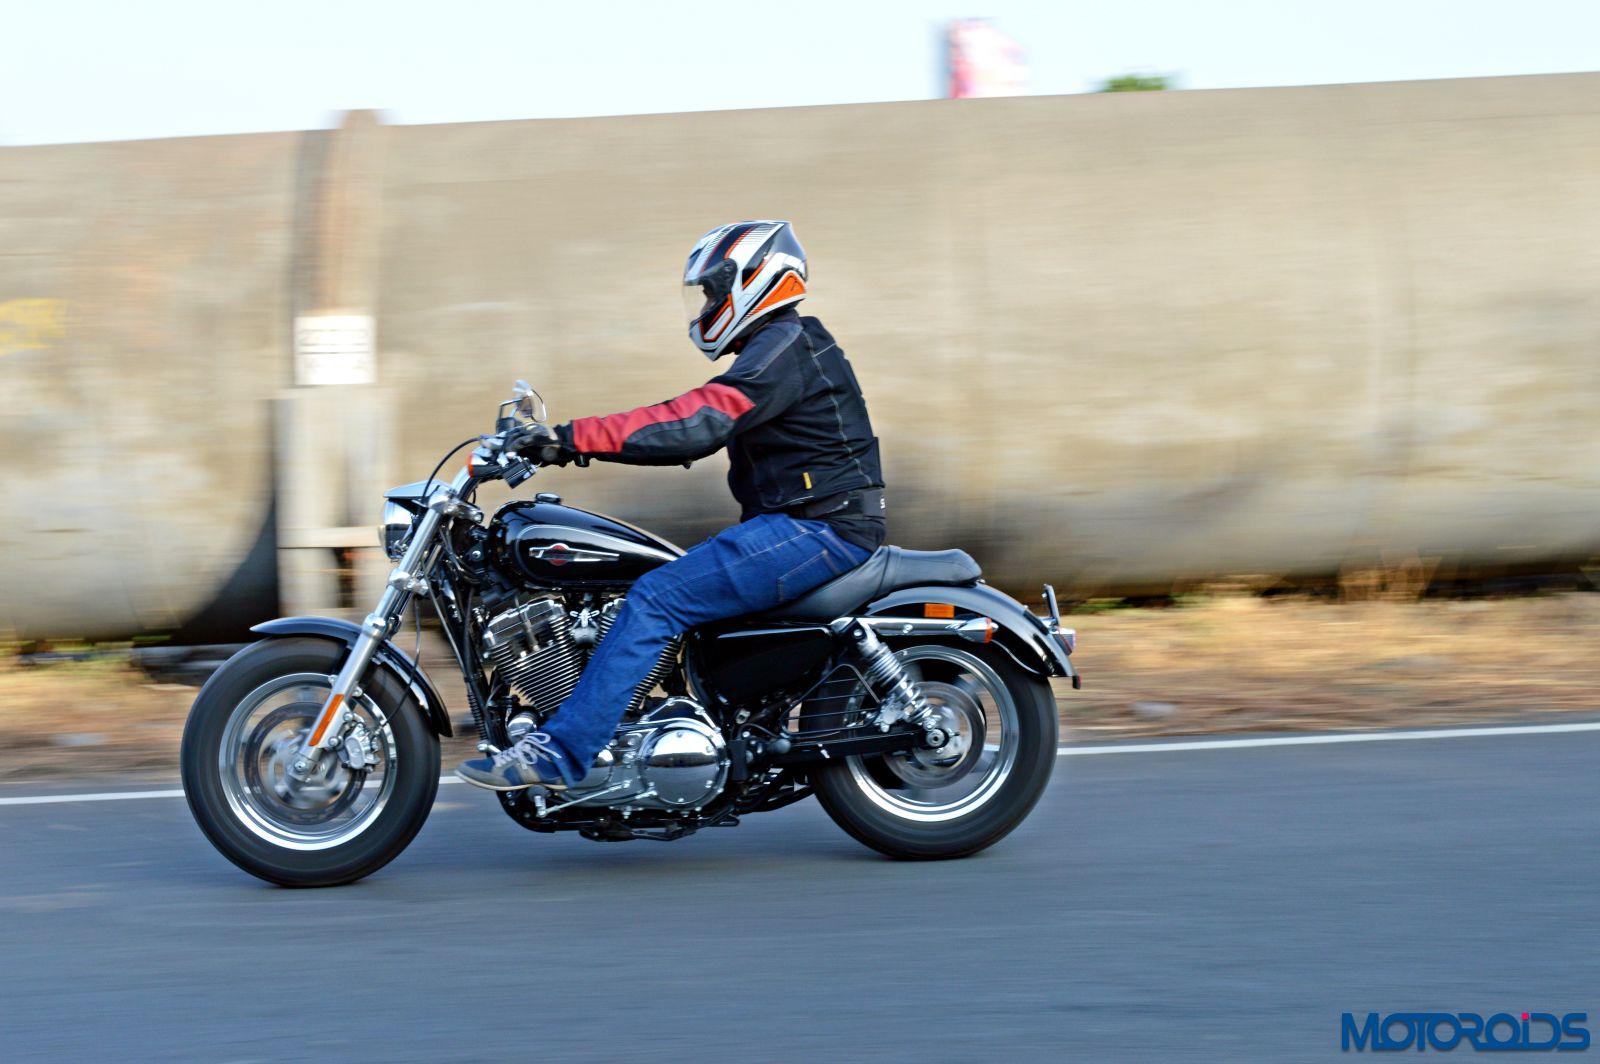 Harley-Davidson 1200 Custom Review - Action Shots (12)